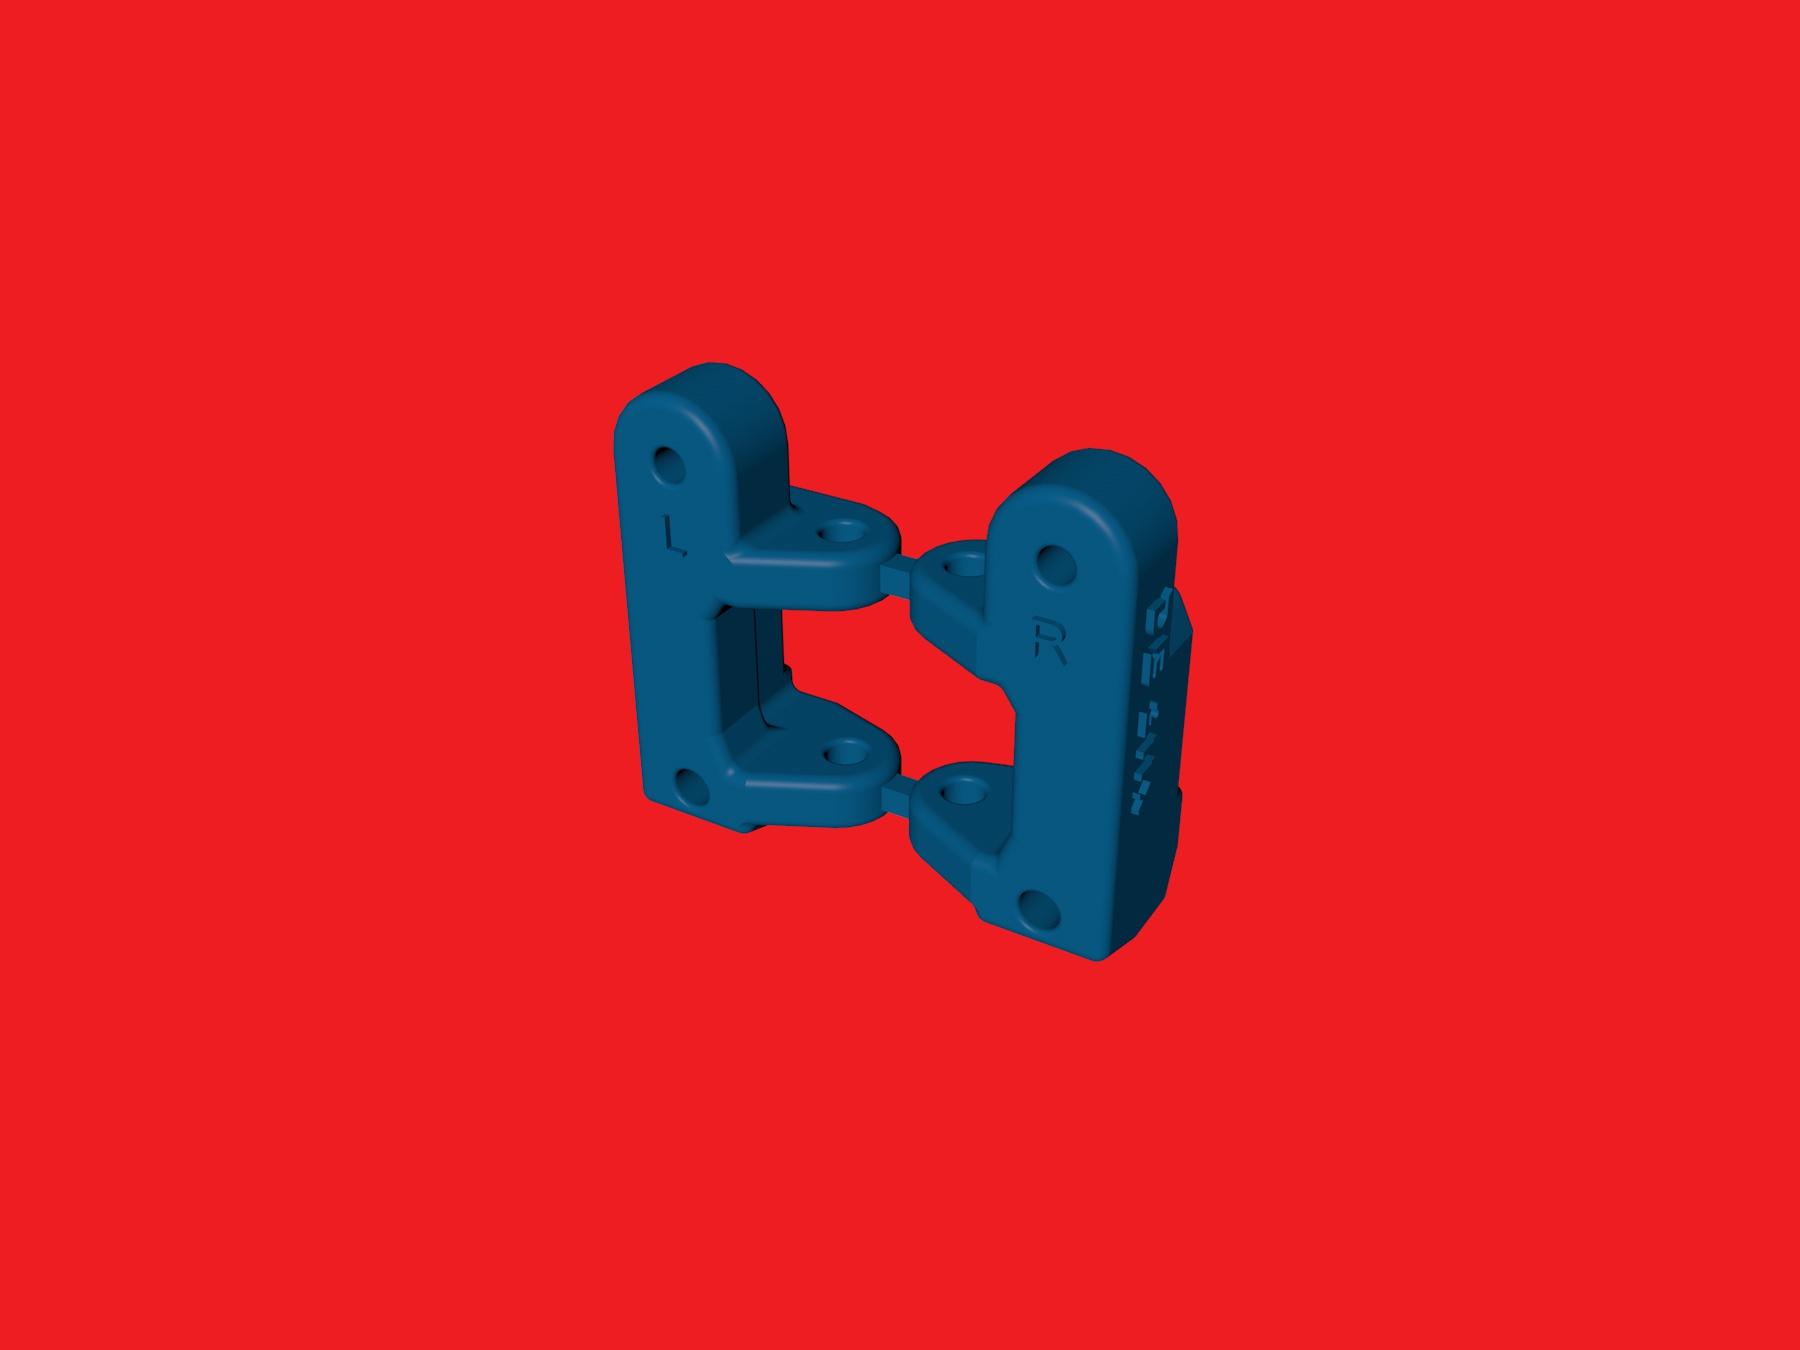 tamiya wrenchdog dyna blaster dyna storm tr-15t h1 h2 c-hubs 3deb reinforced